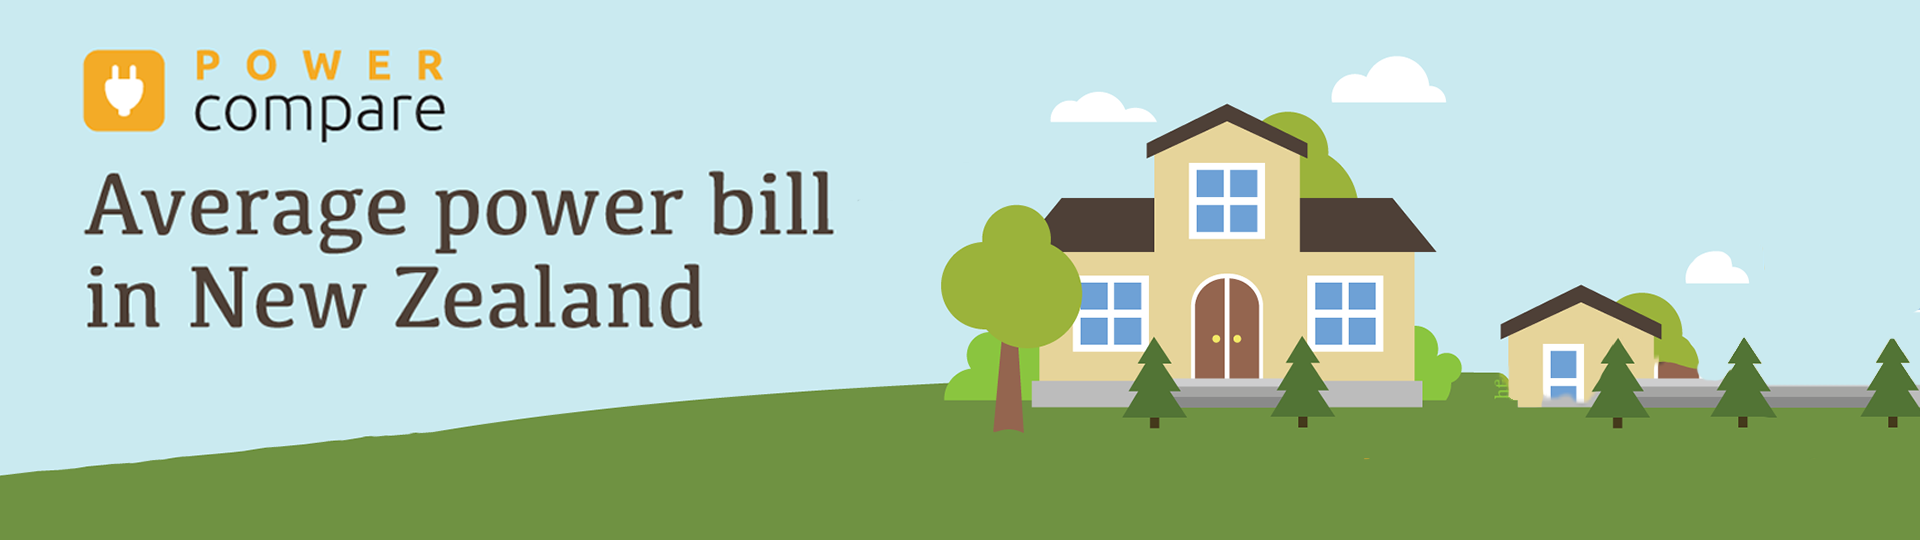 Average Power Bill in New Zealand